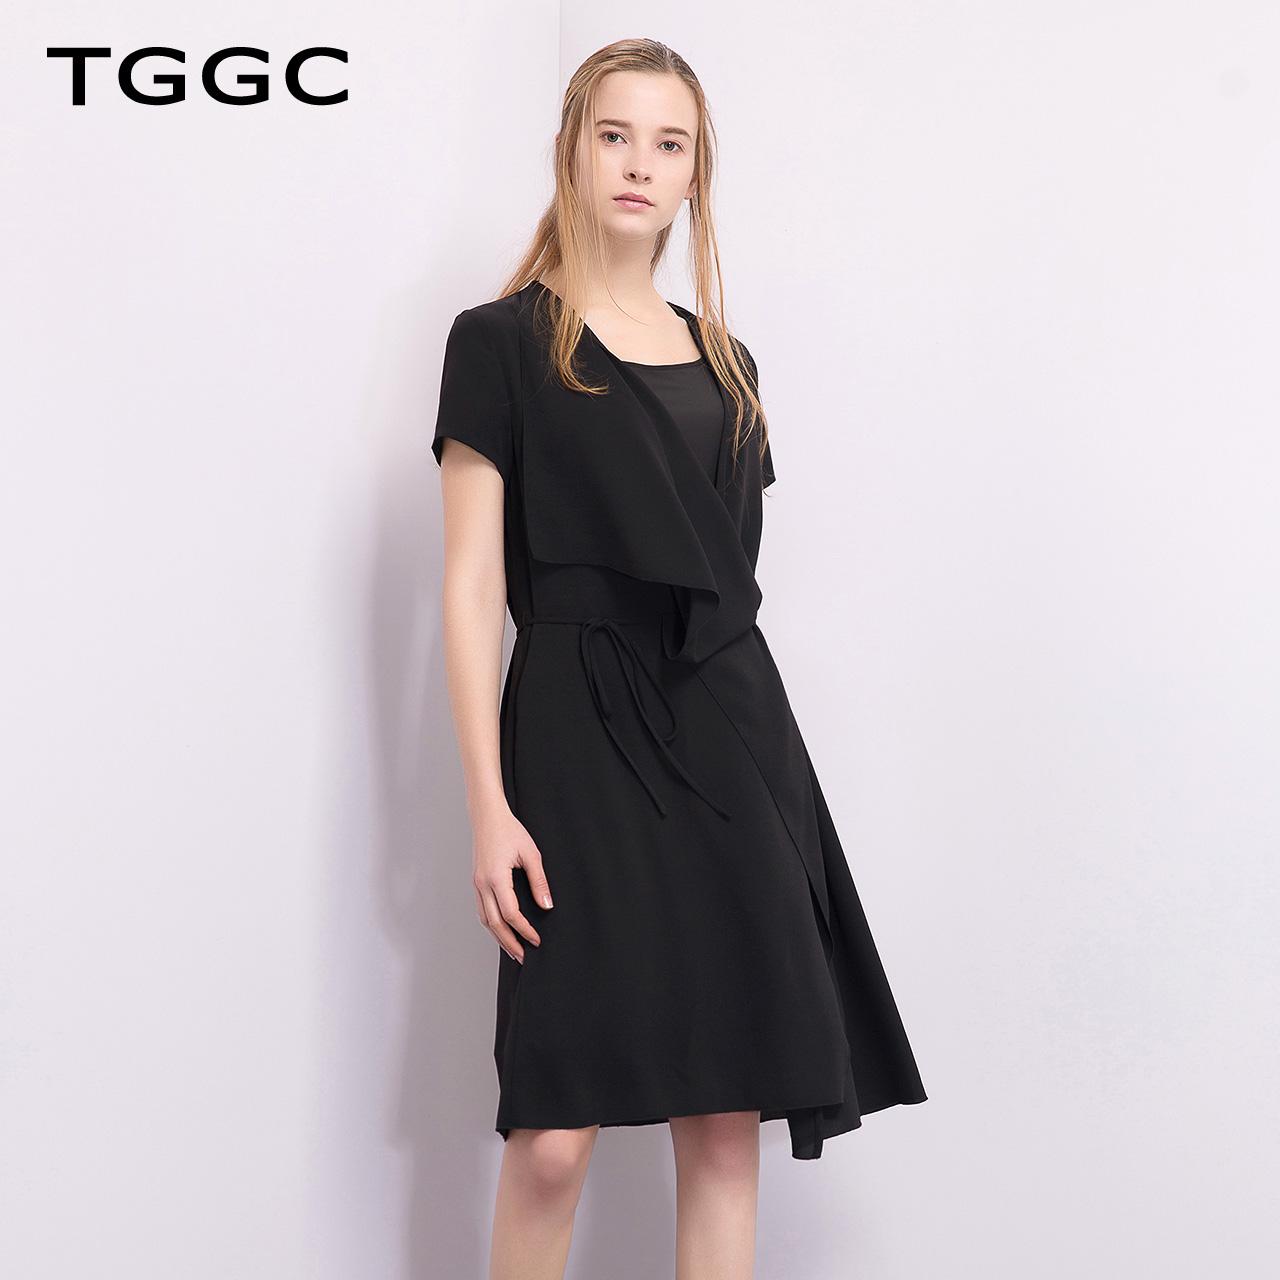 TGGC 2018年夏装 宽松不规则下摆显瘦气质女短袖连衣裙 F20613